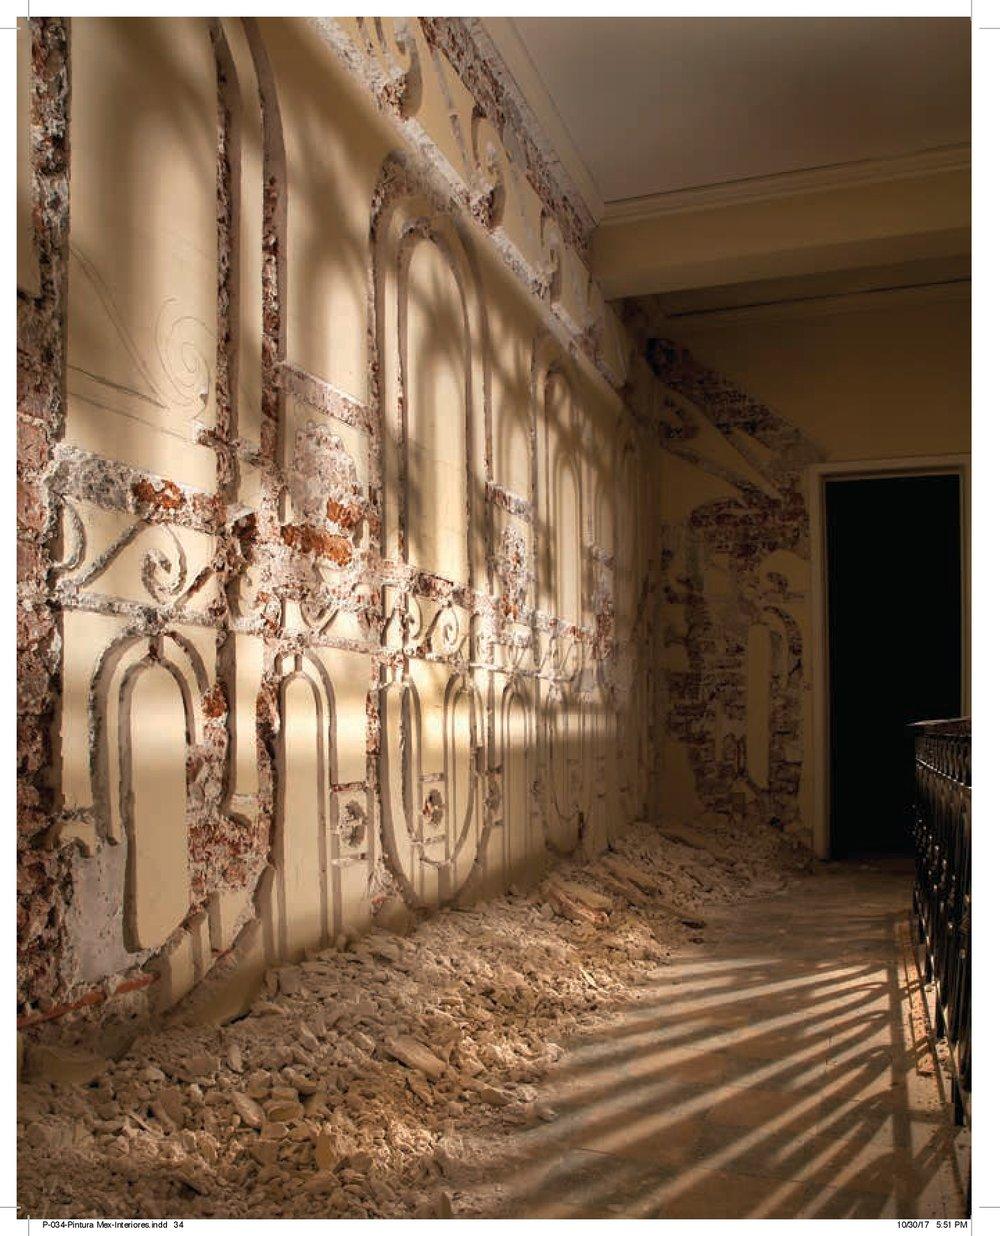 P-034-Pintura-Mex-Interiores-L04-3-034.jpg